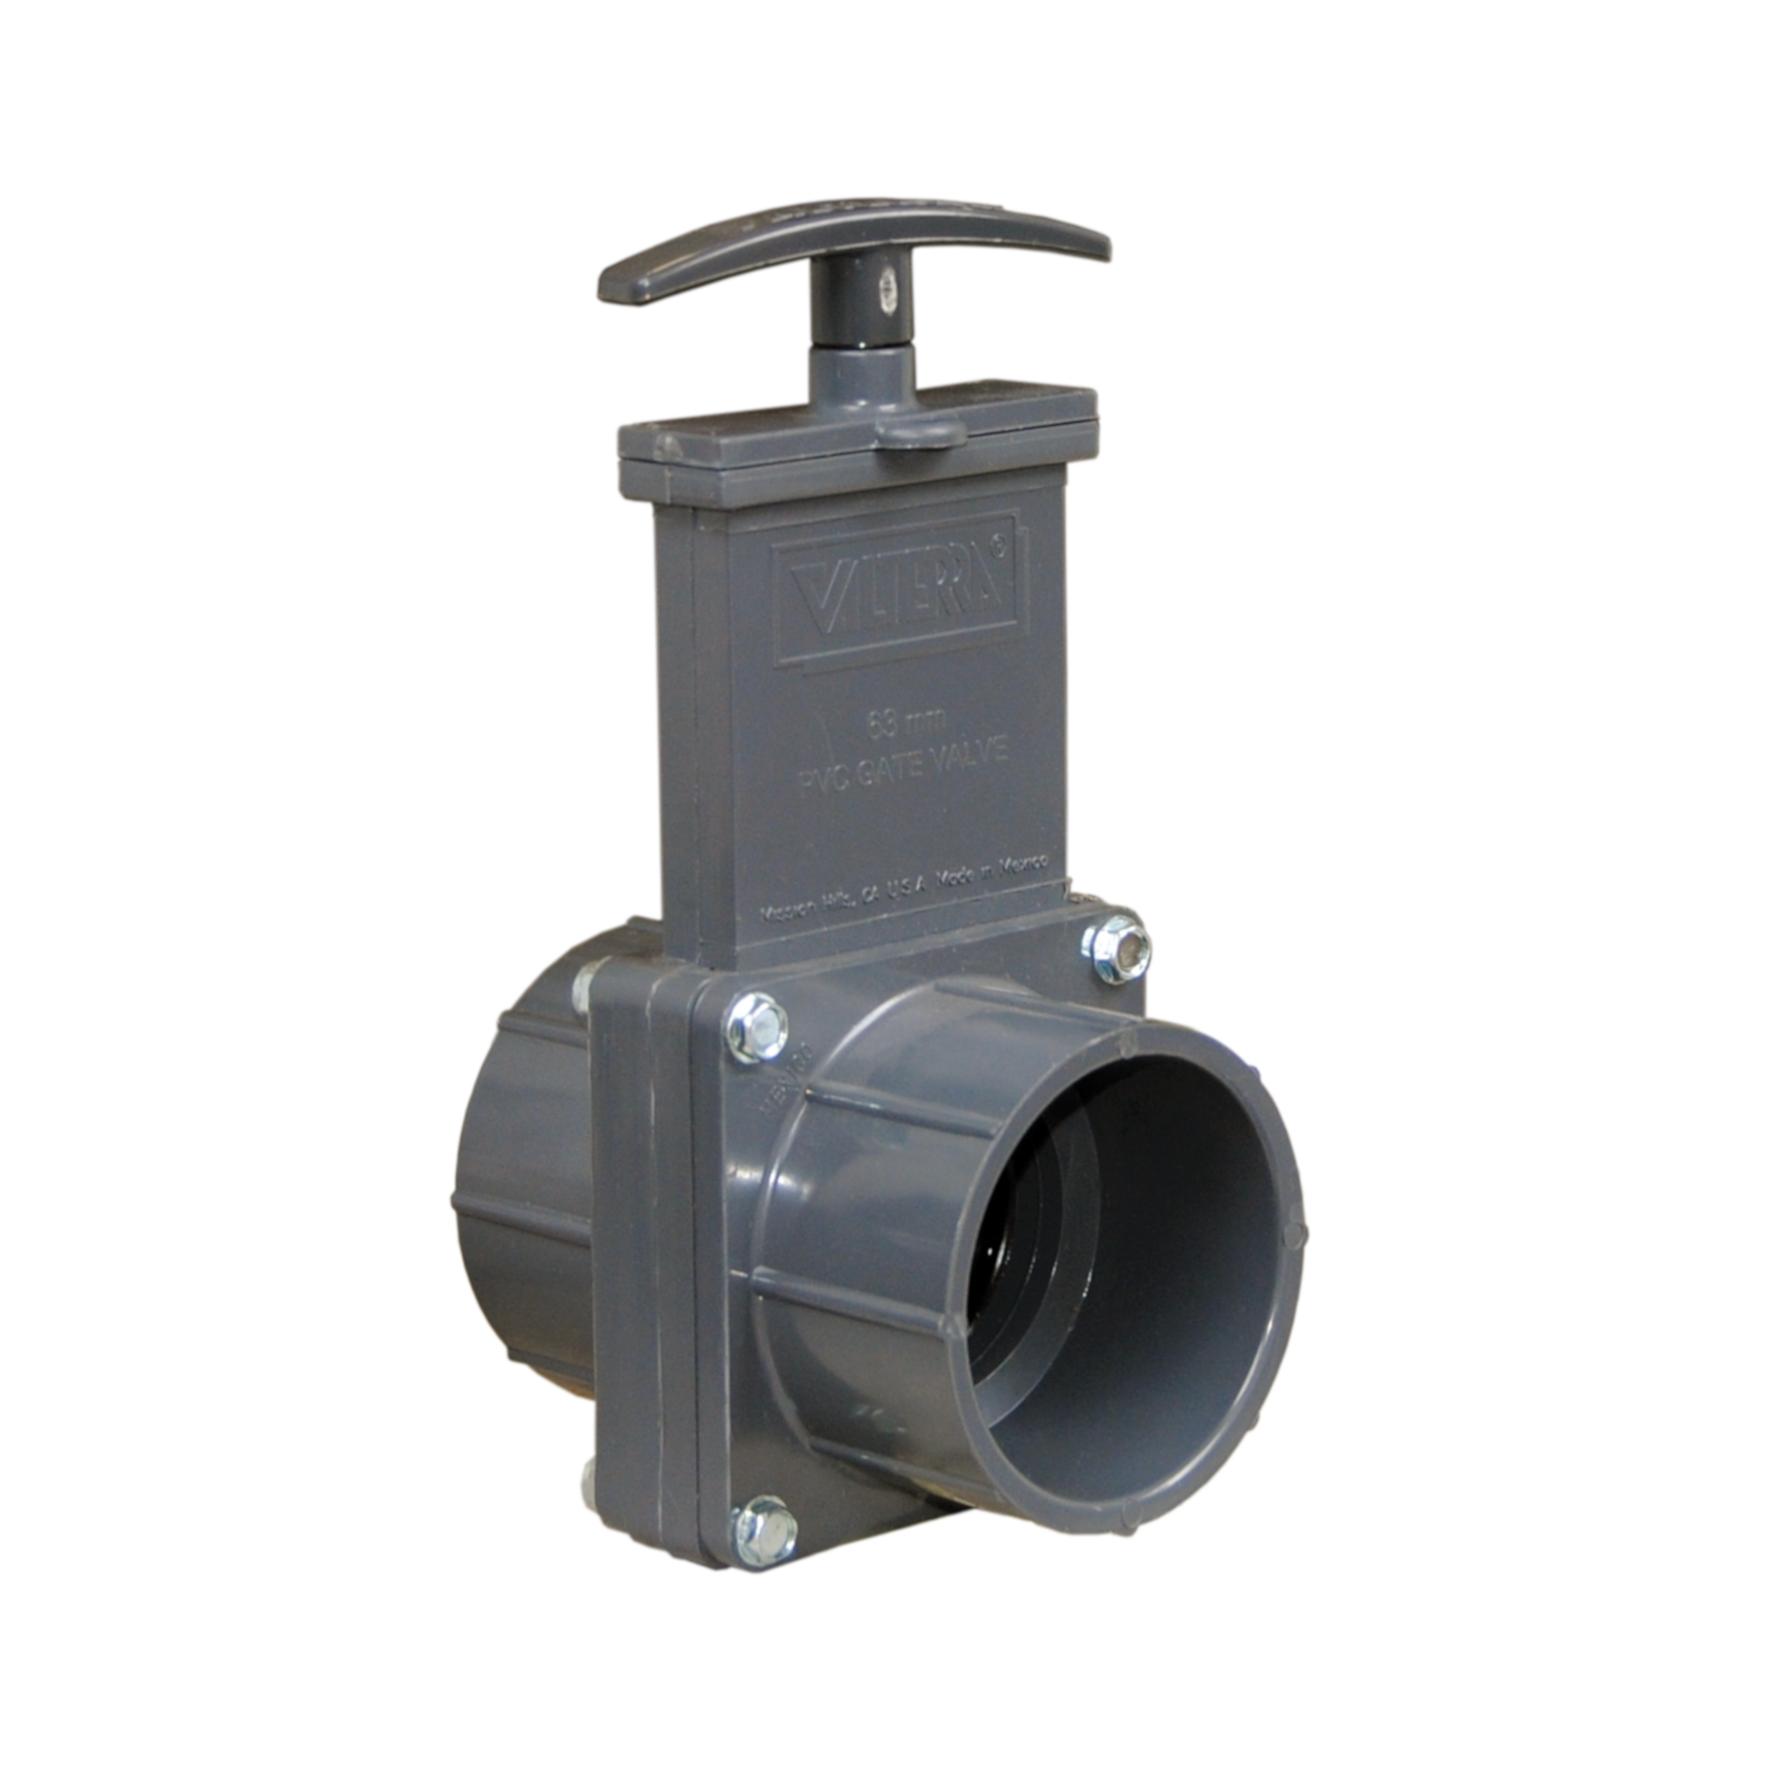 PVC-U gate valve - EFFAST - 100% Made in Italy